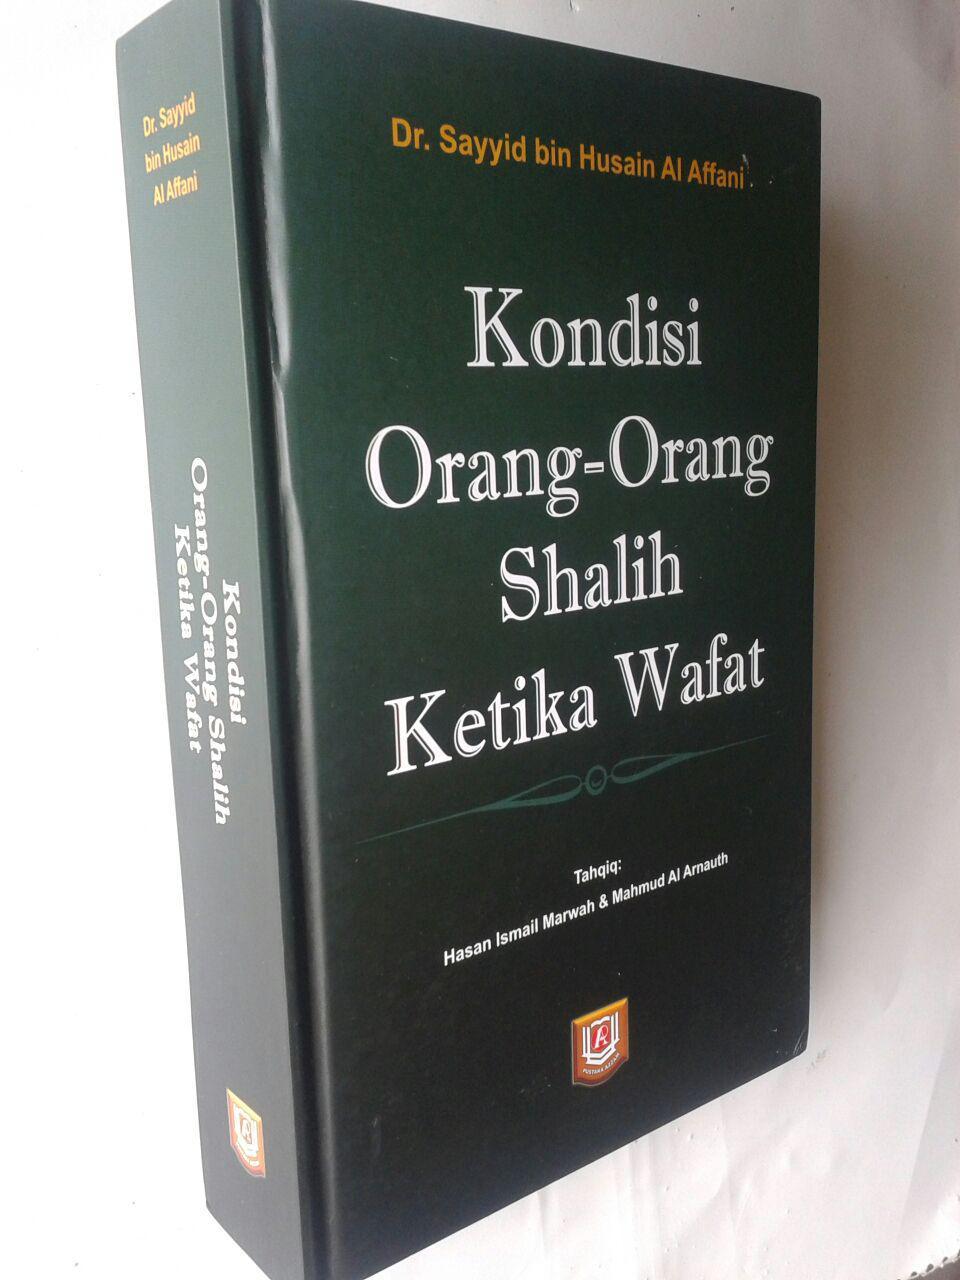 Buku Kondisi Orang-Orang Shalih Ketika Wafat cover 3